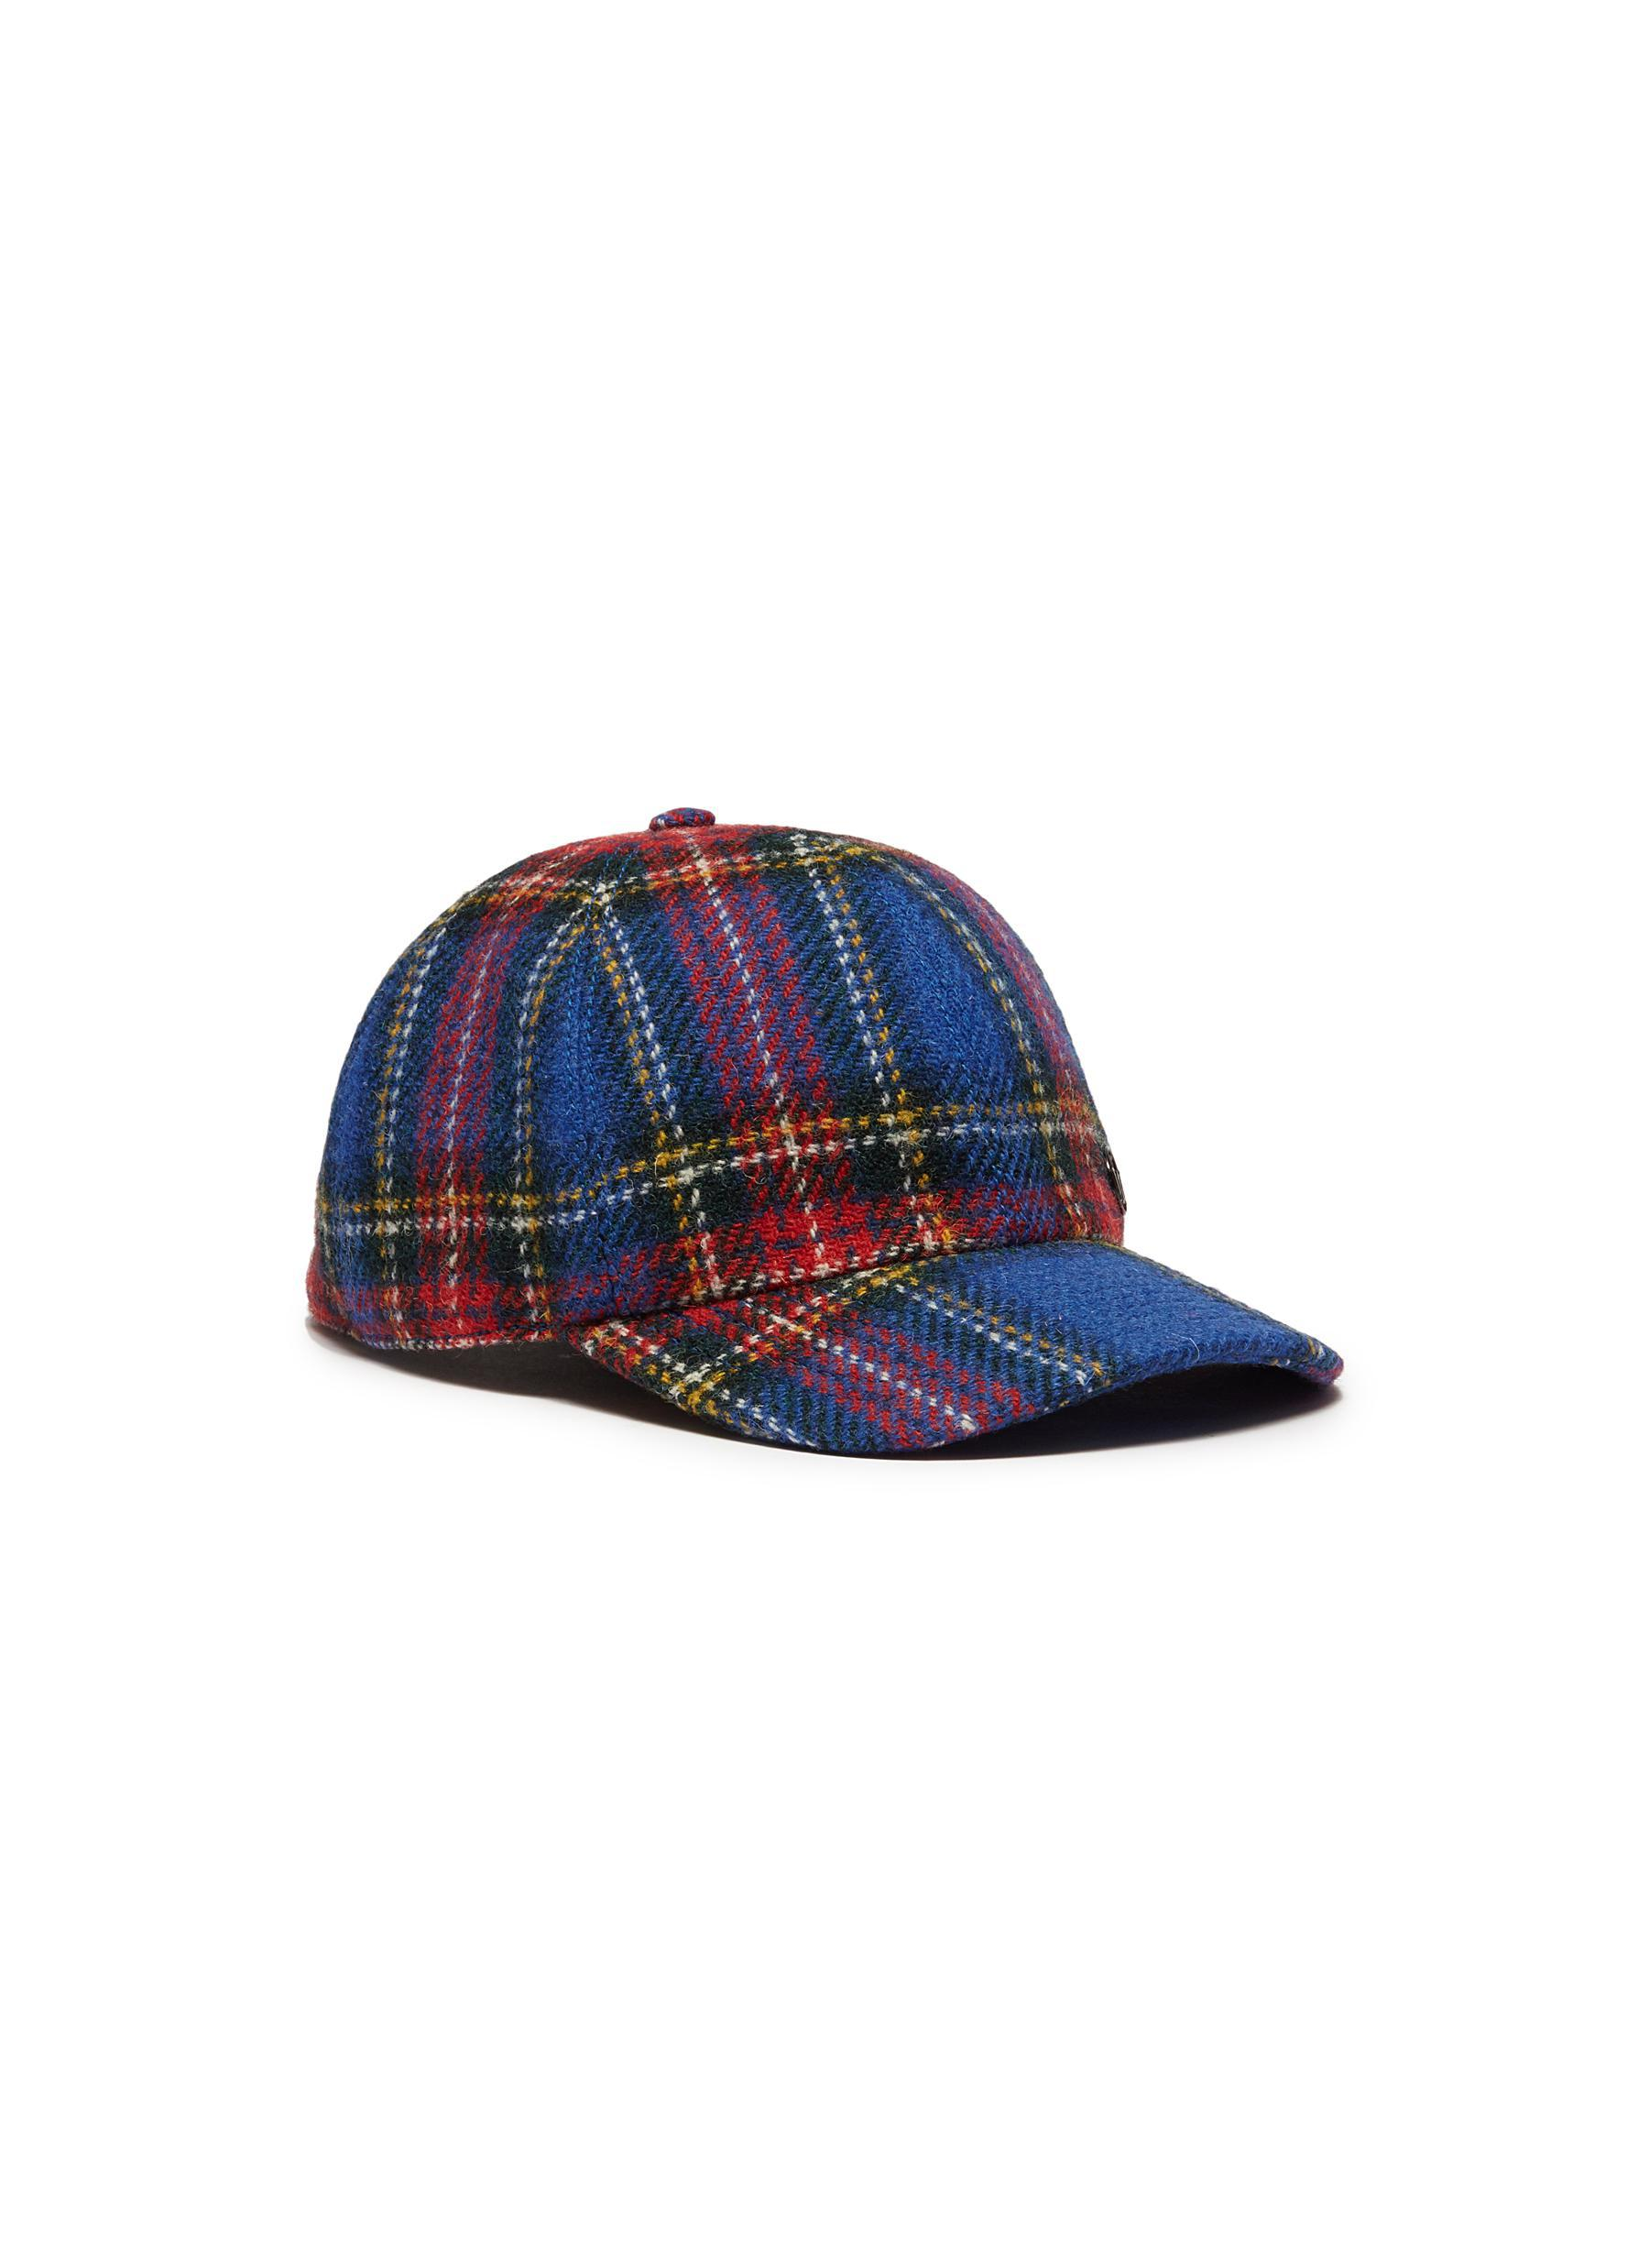 Maison Michel  tiger  Tartan Plaid Baseball Cap in Blue - Lyst 911c557b4bd5